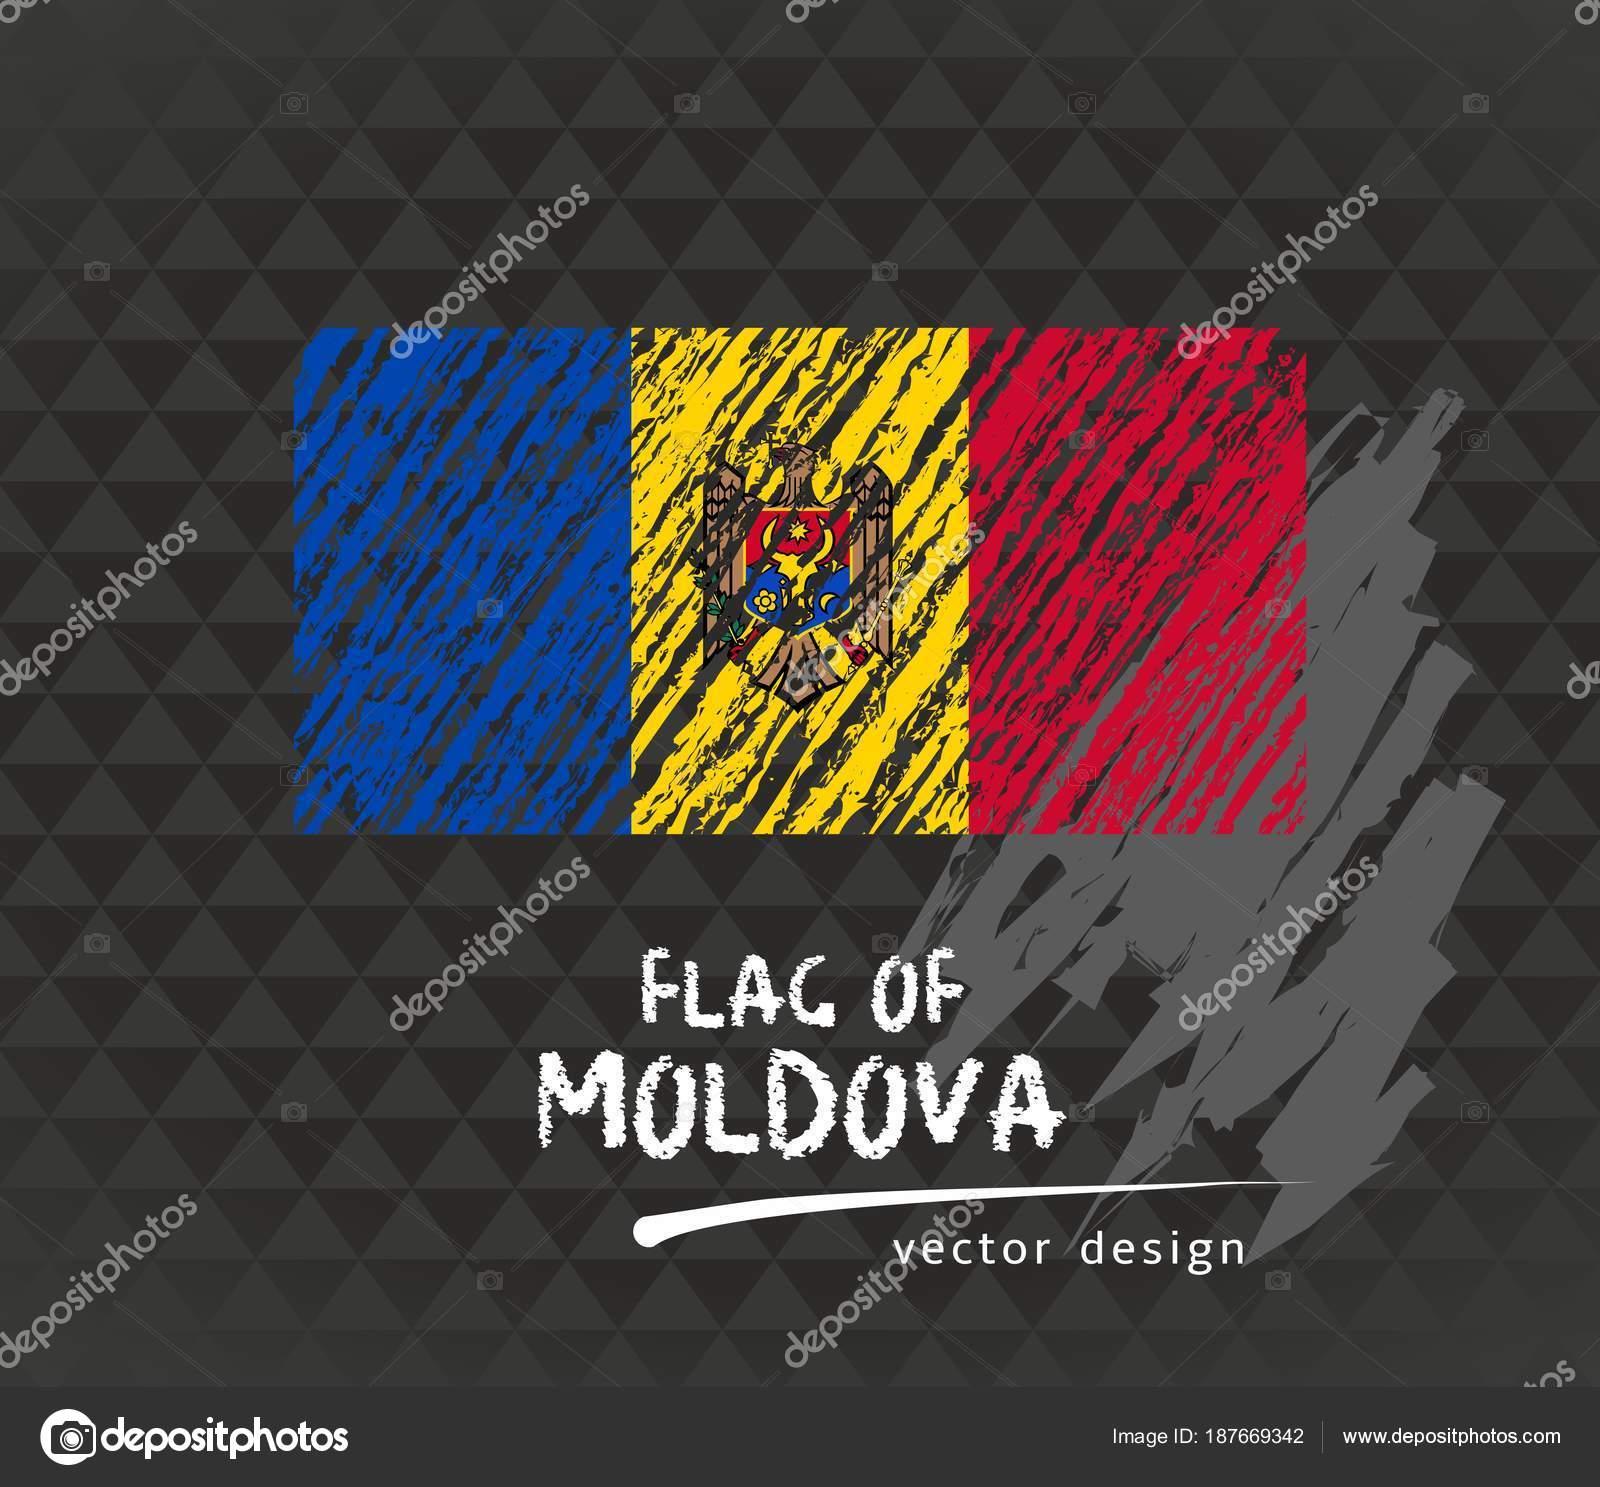 Moldova Flag Vector Sketch Hand Drawn Illustration Dark Grunge ...